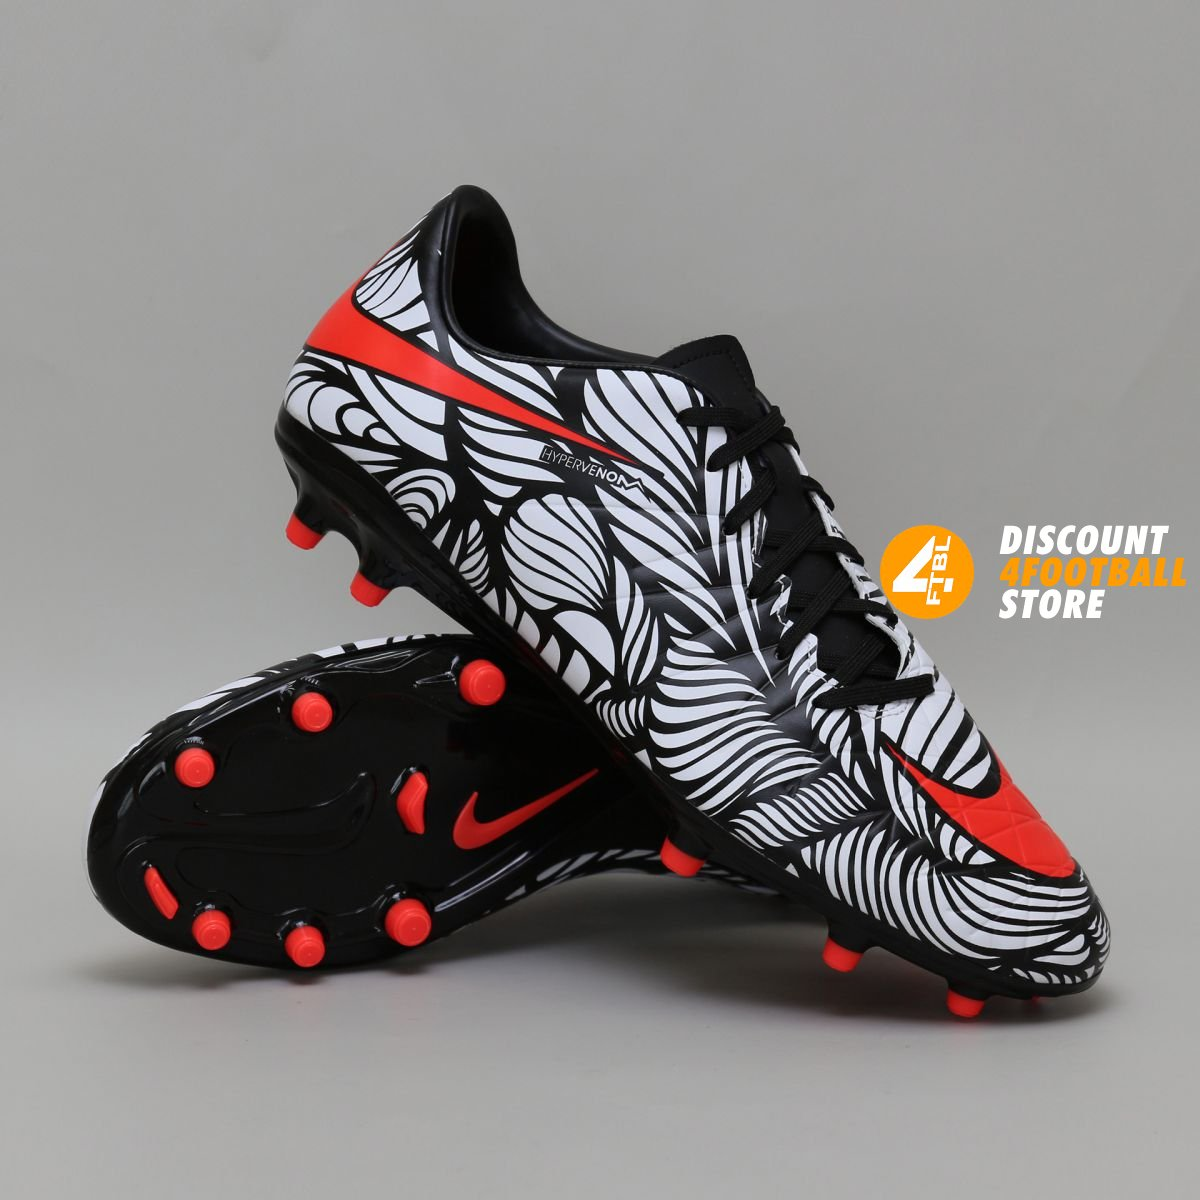 56f121f9 Бутсы Nike Hypervenom Phelon 2 FG Neymar Limited Edition (820113-061) ...